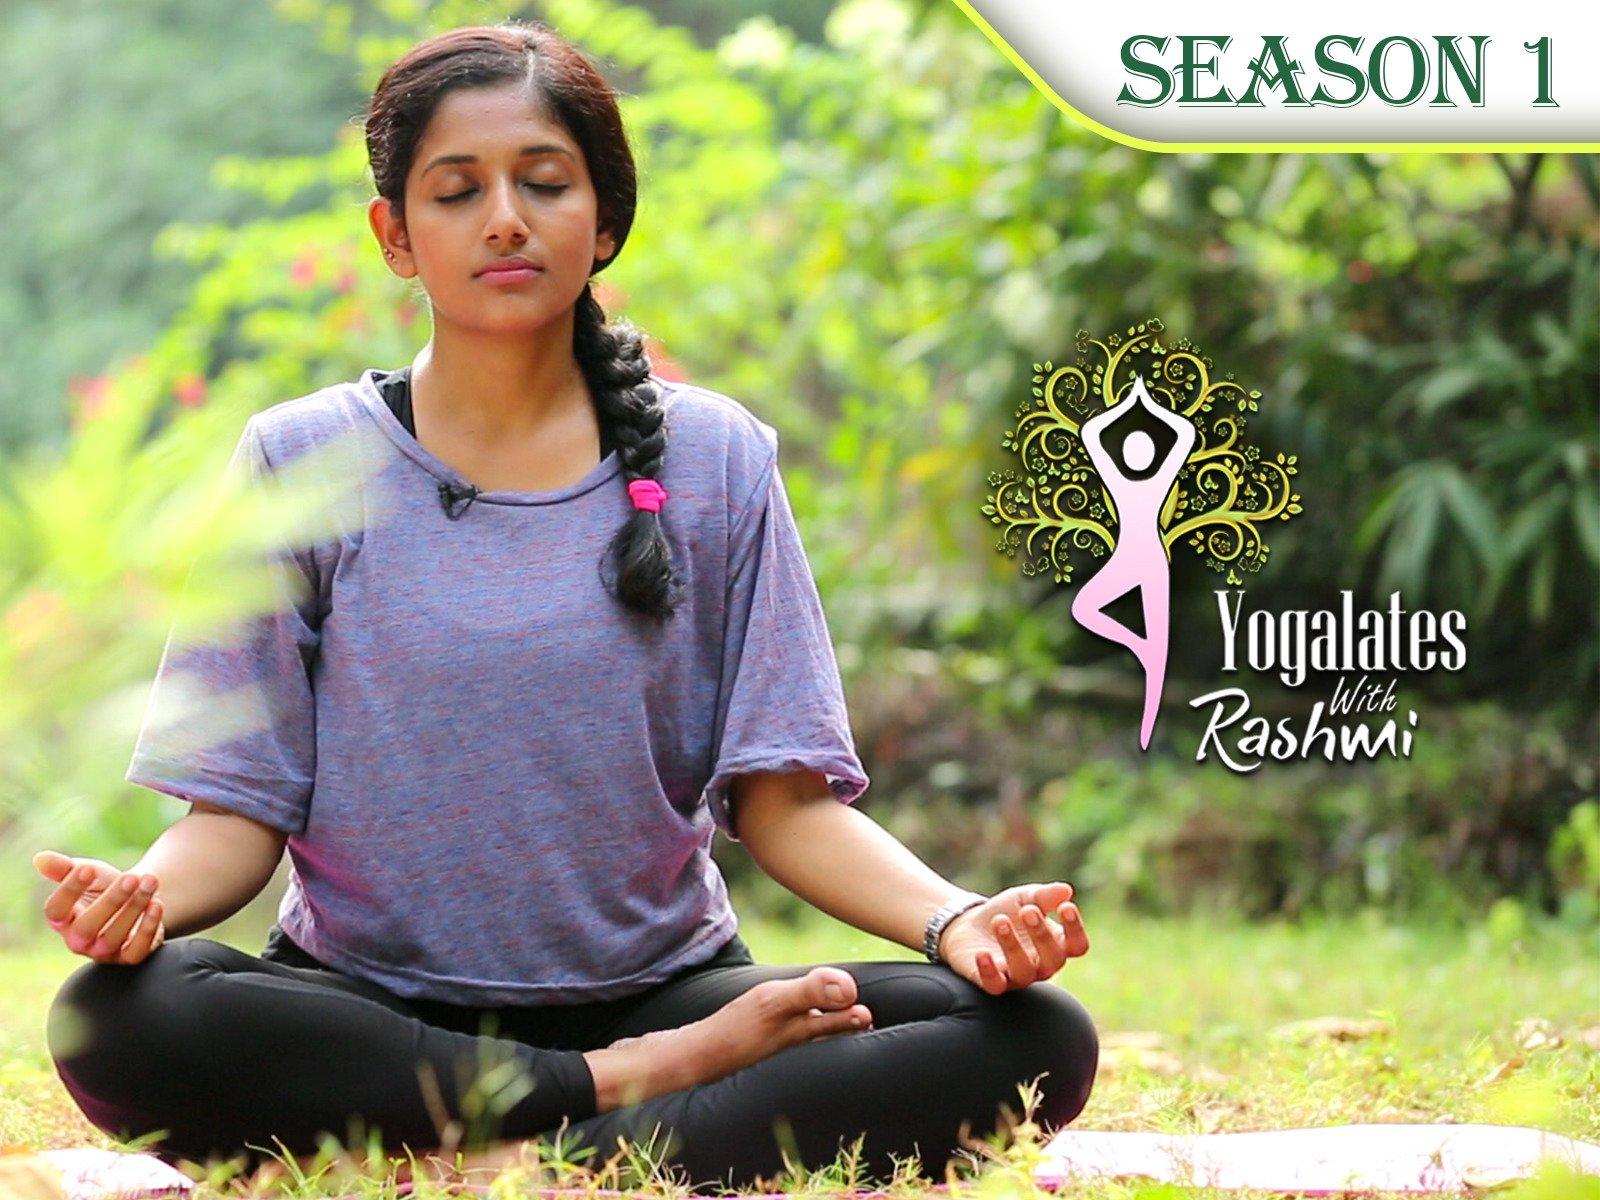 Yogalates With Rashmi Ramesh - Season 1